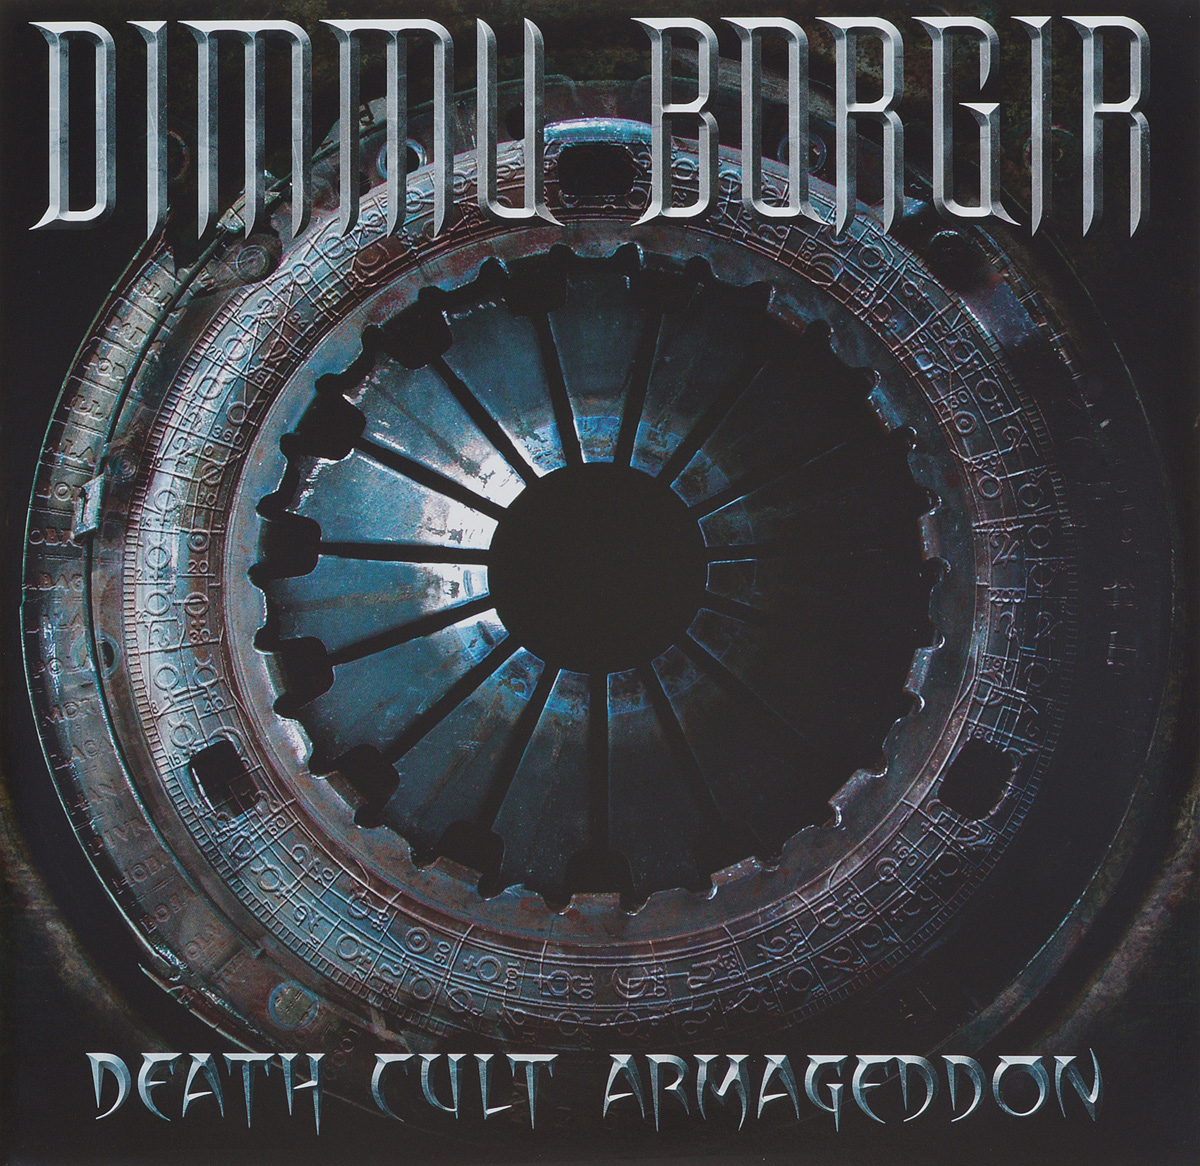 Dimmu Borgir Dimmu Borgir. Death Cult Armageddon (2 LP) dimmu borgir dimmu borgir puritanical euphoric misanthropia